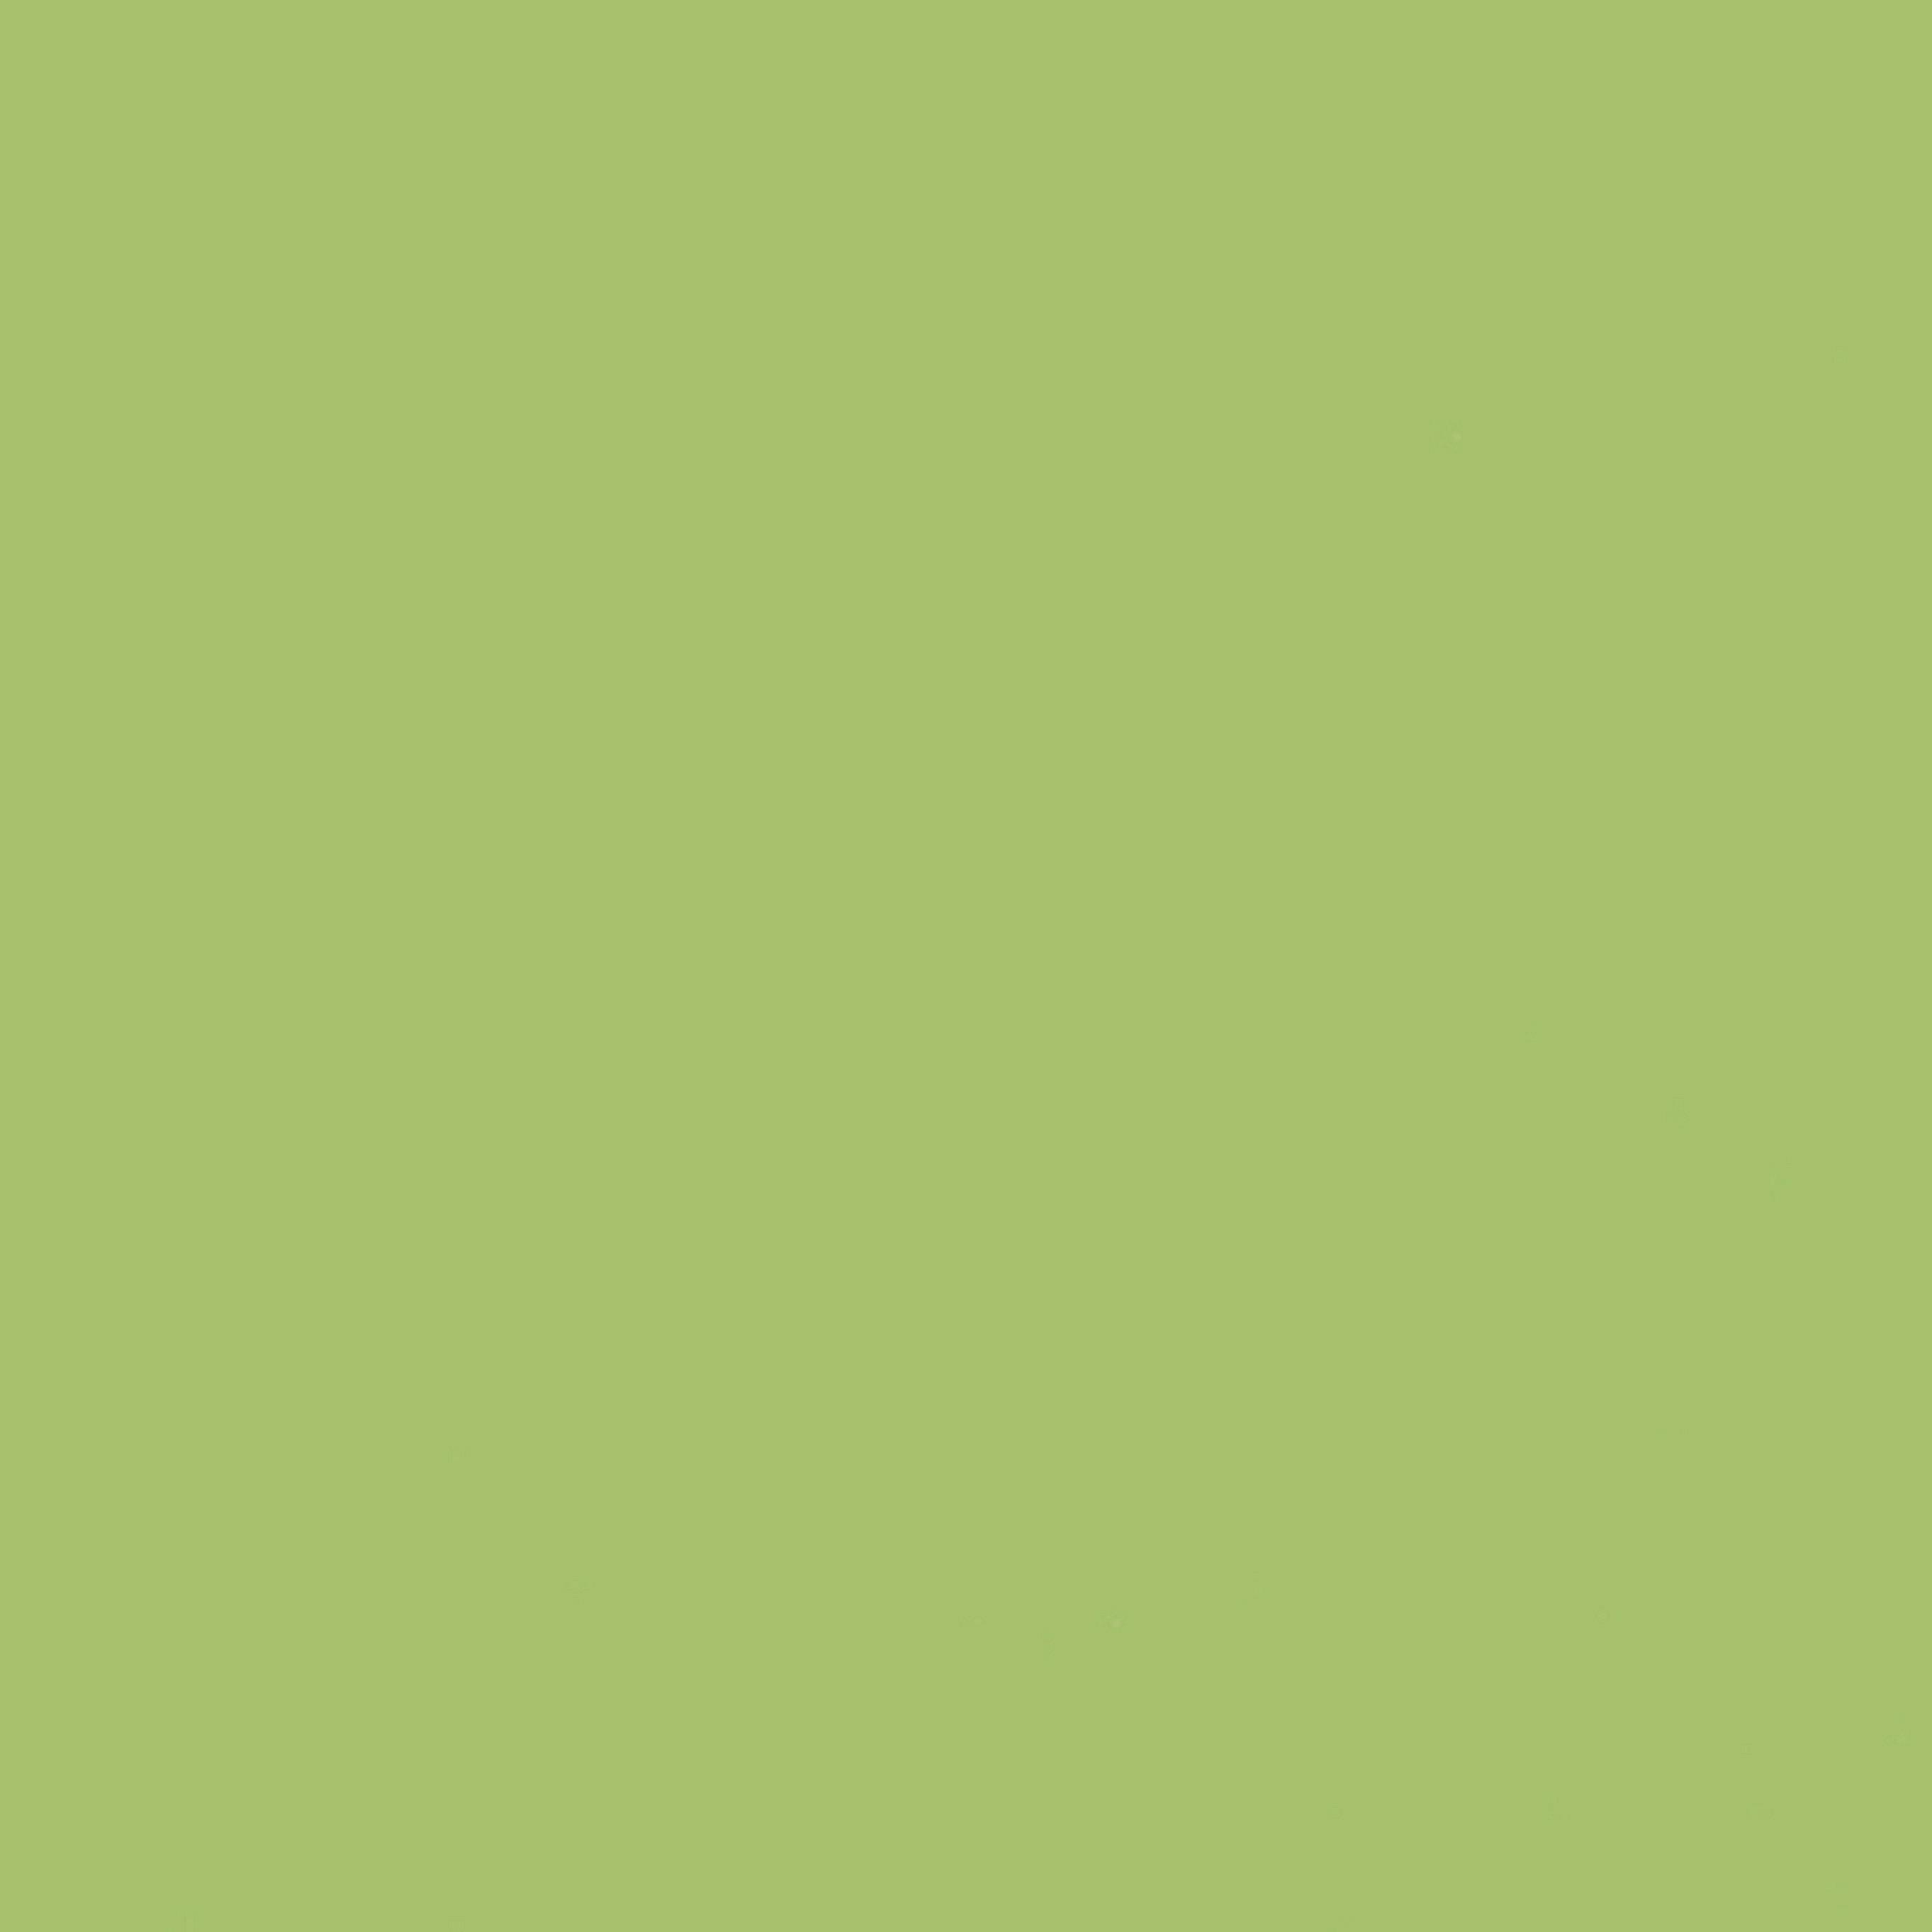 060A Lime